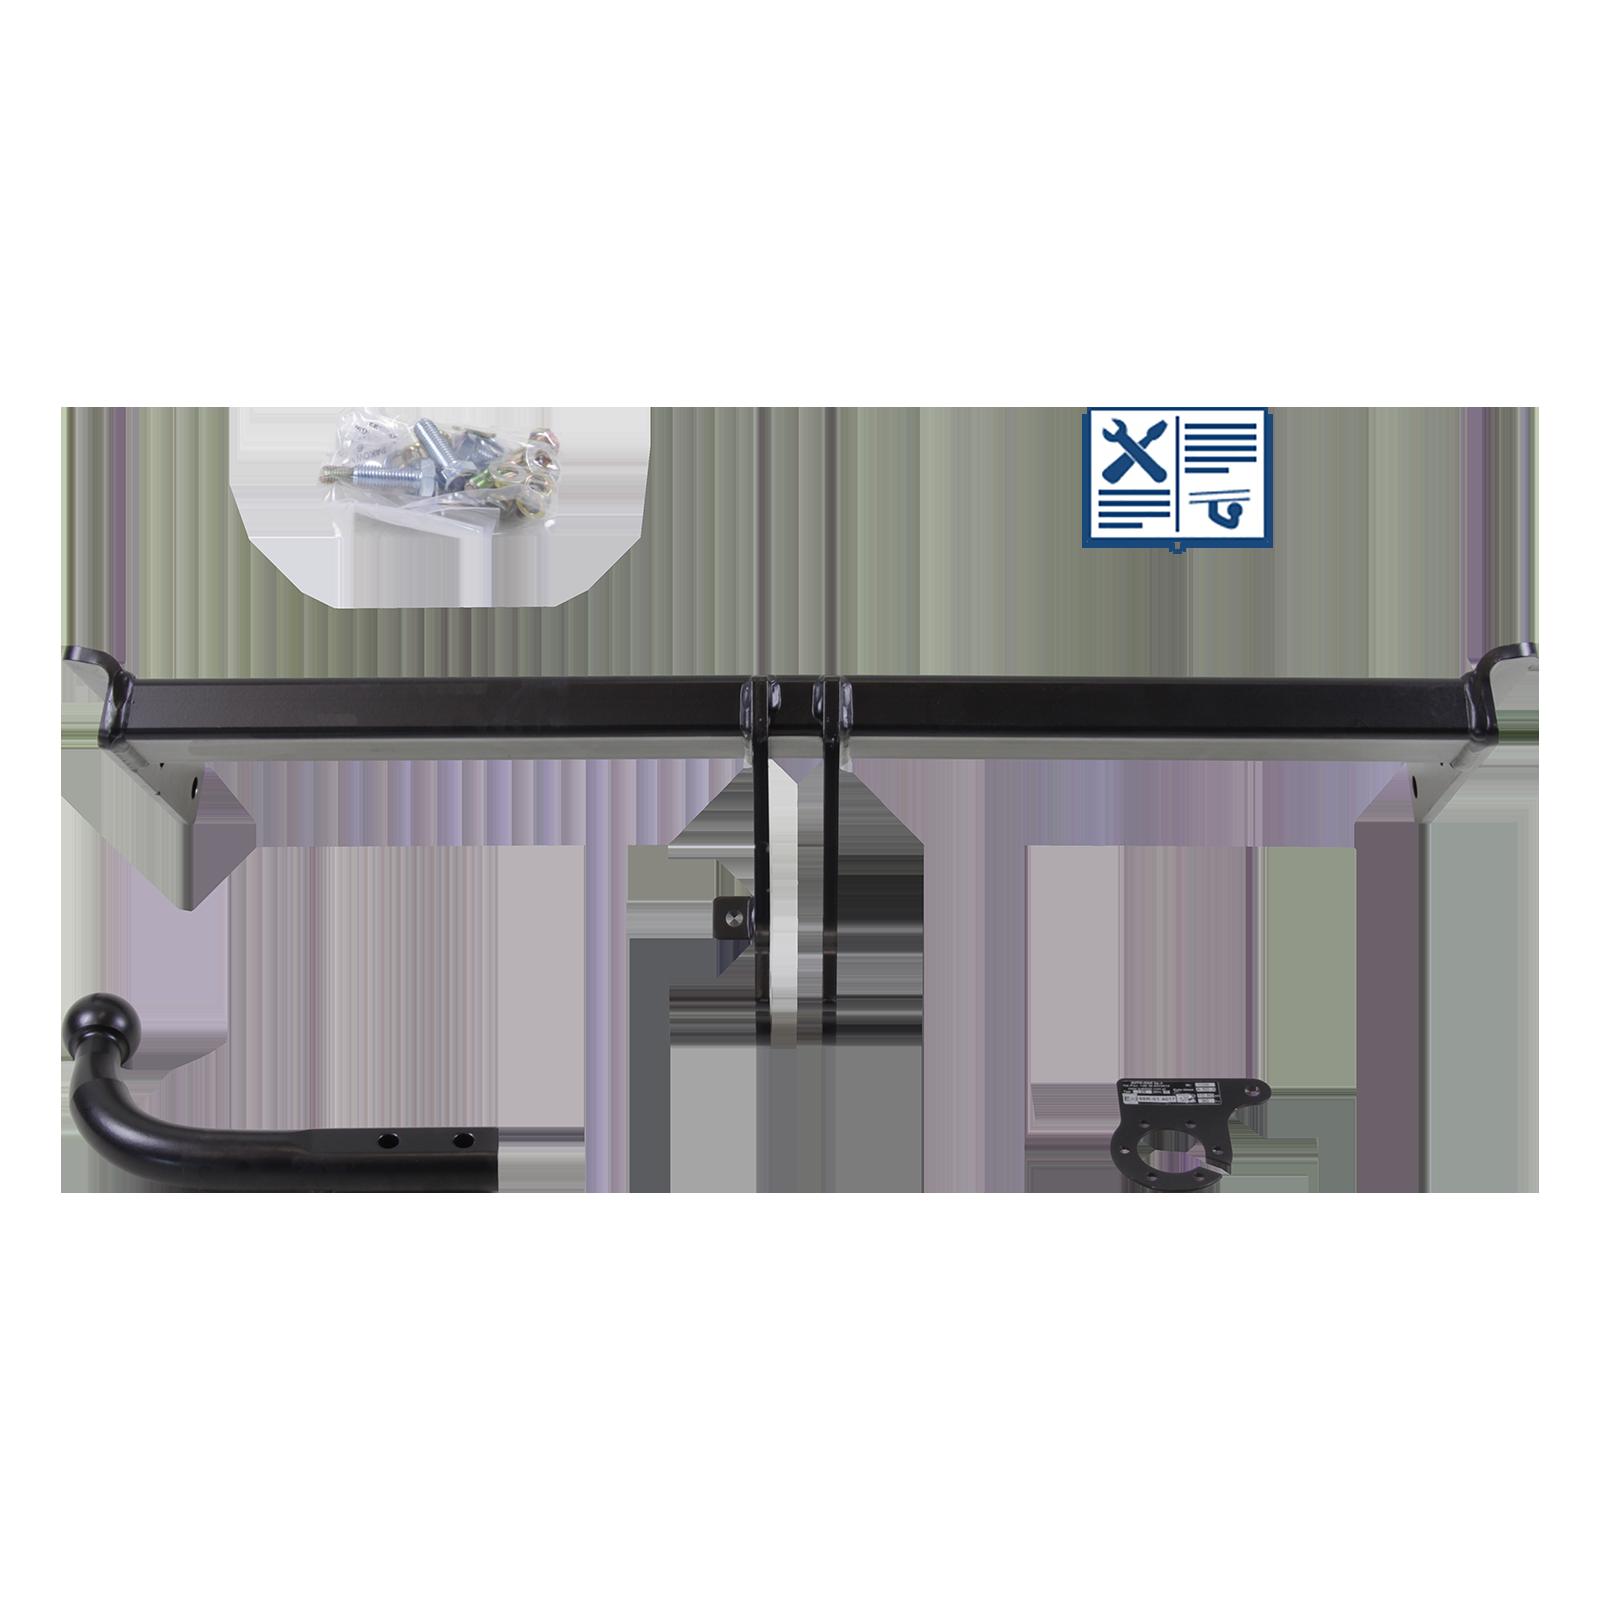 VOLVO V60 I AUTO-HAK Towbar Rigid Incl. 7 Pin E-set